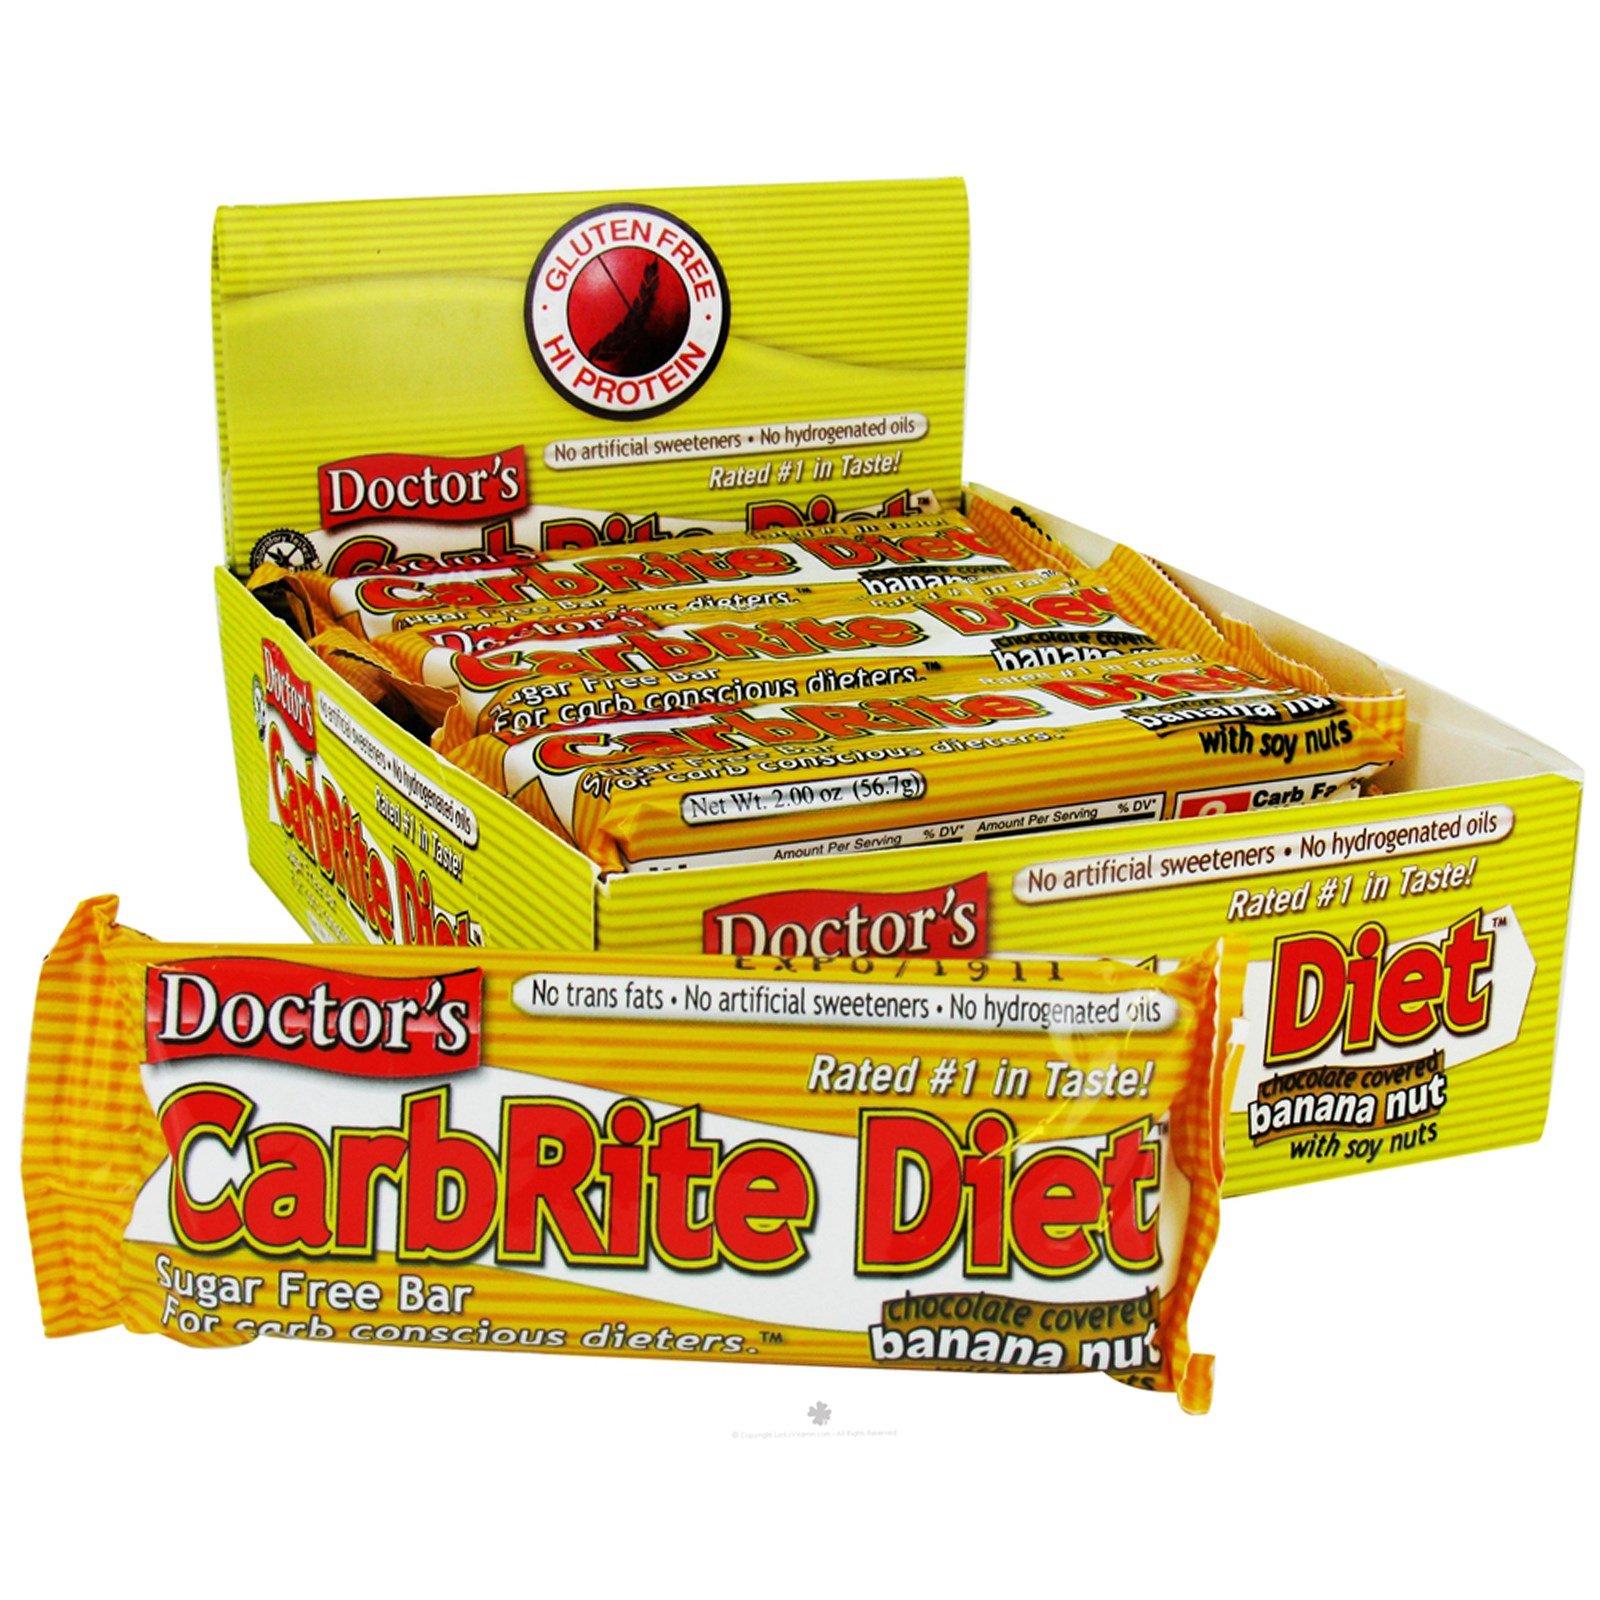 Universal Nutrition, Doctor's CarbRite Diet, без сахара, банан в шоколаде, лесной орех, 12 плиток, по 2 унции (56,7 г) каждая